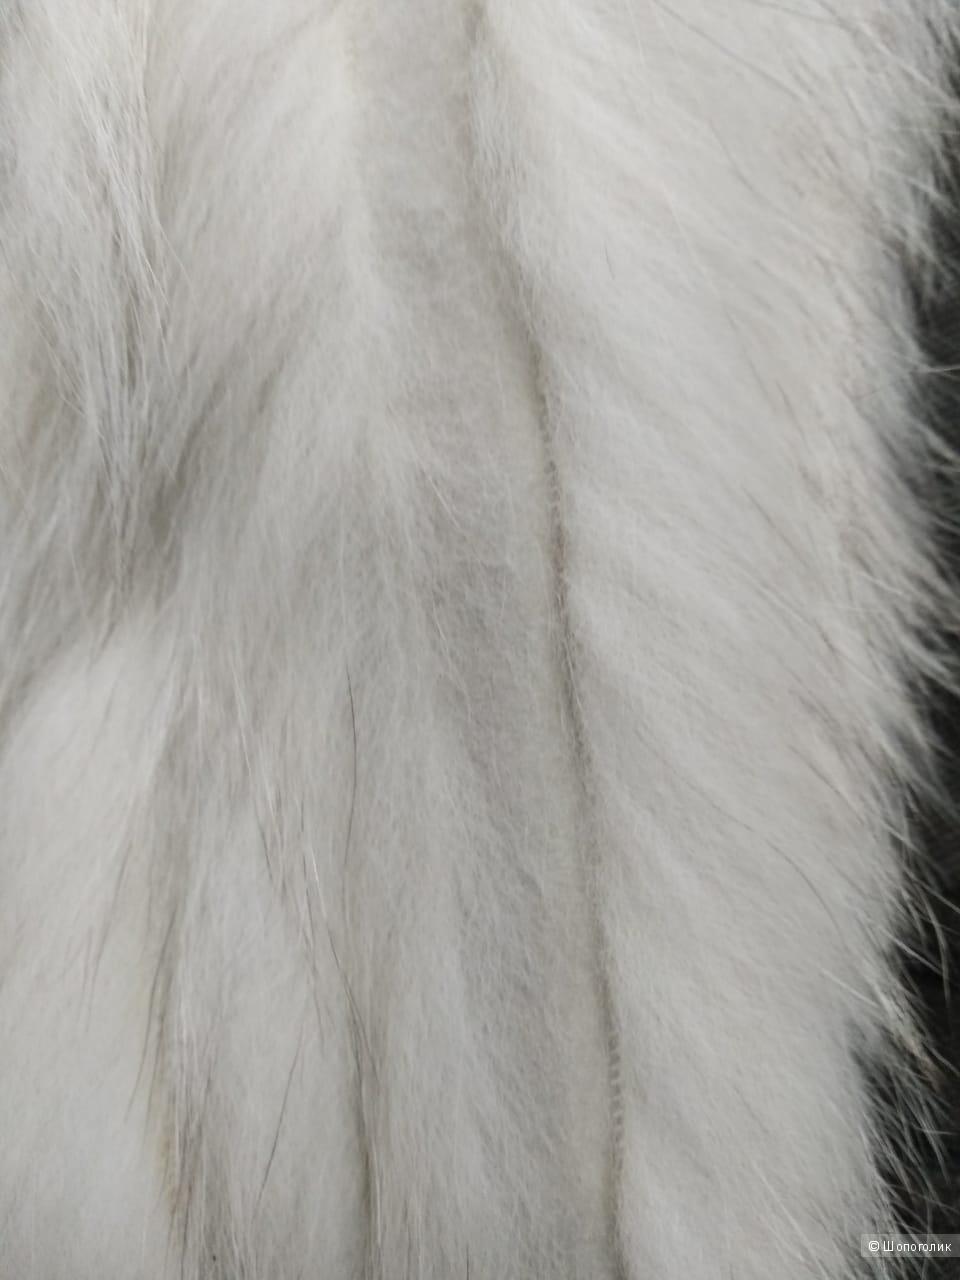 Полушубок Sаga Fox, размер 44-46